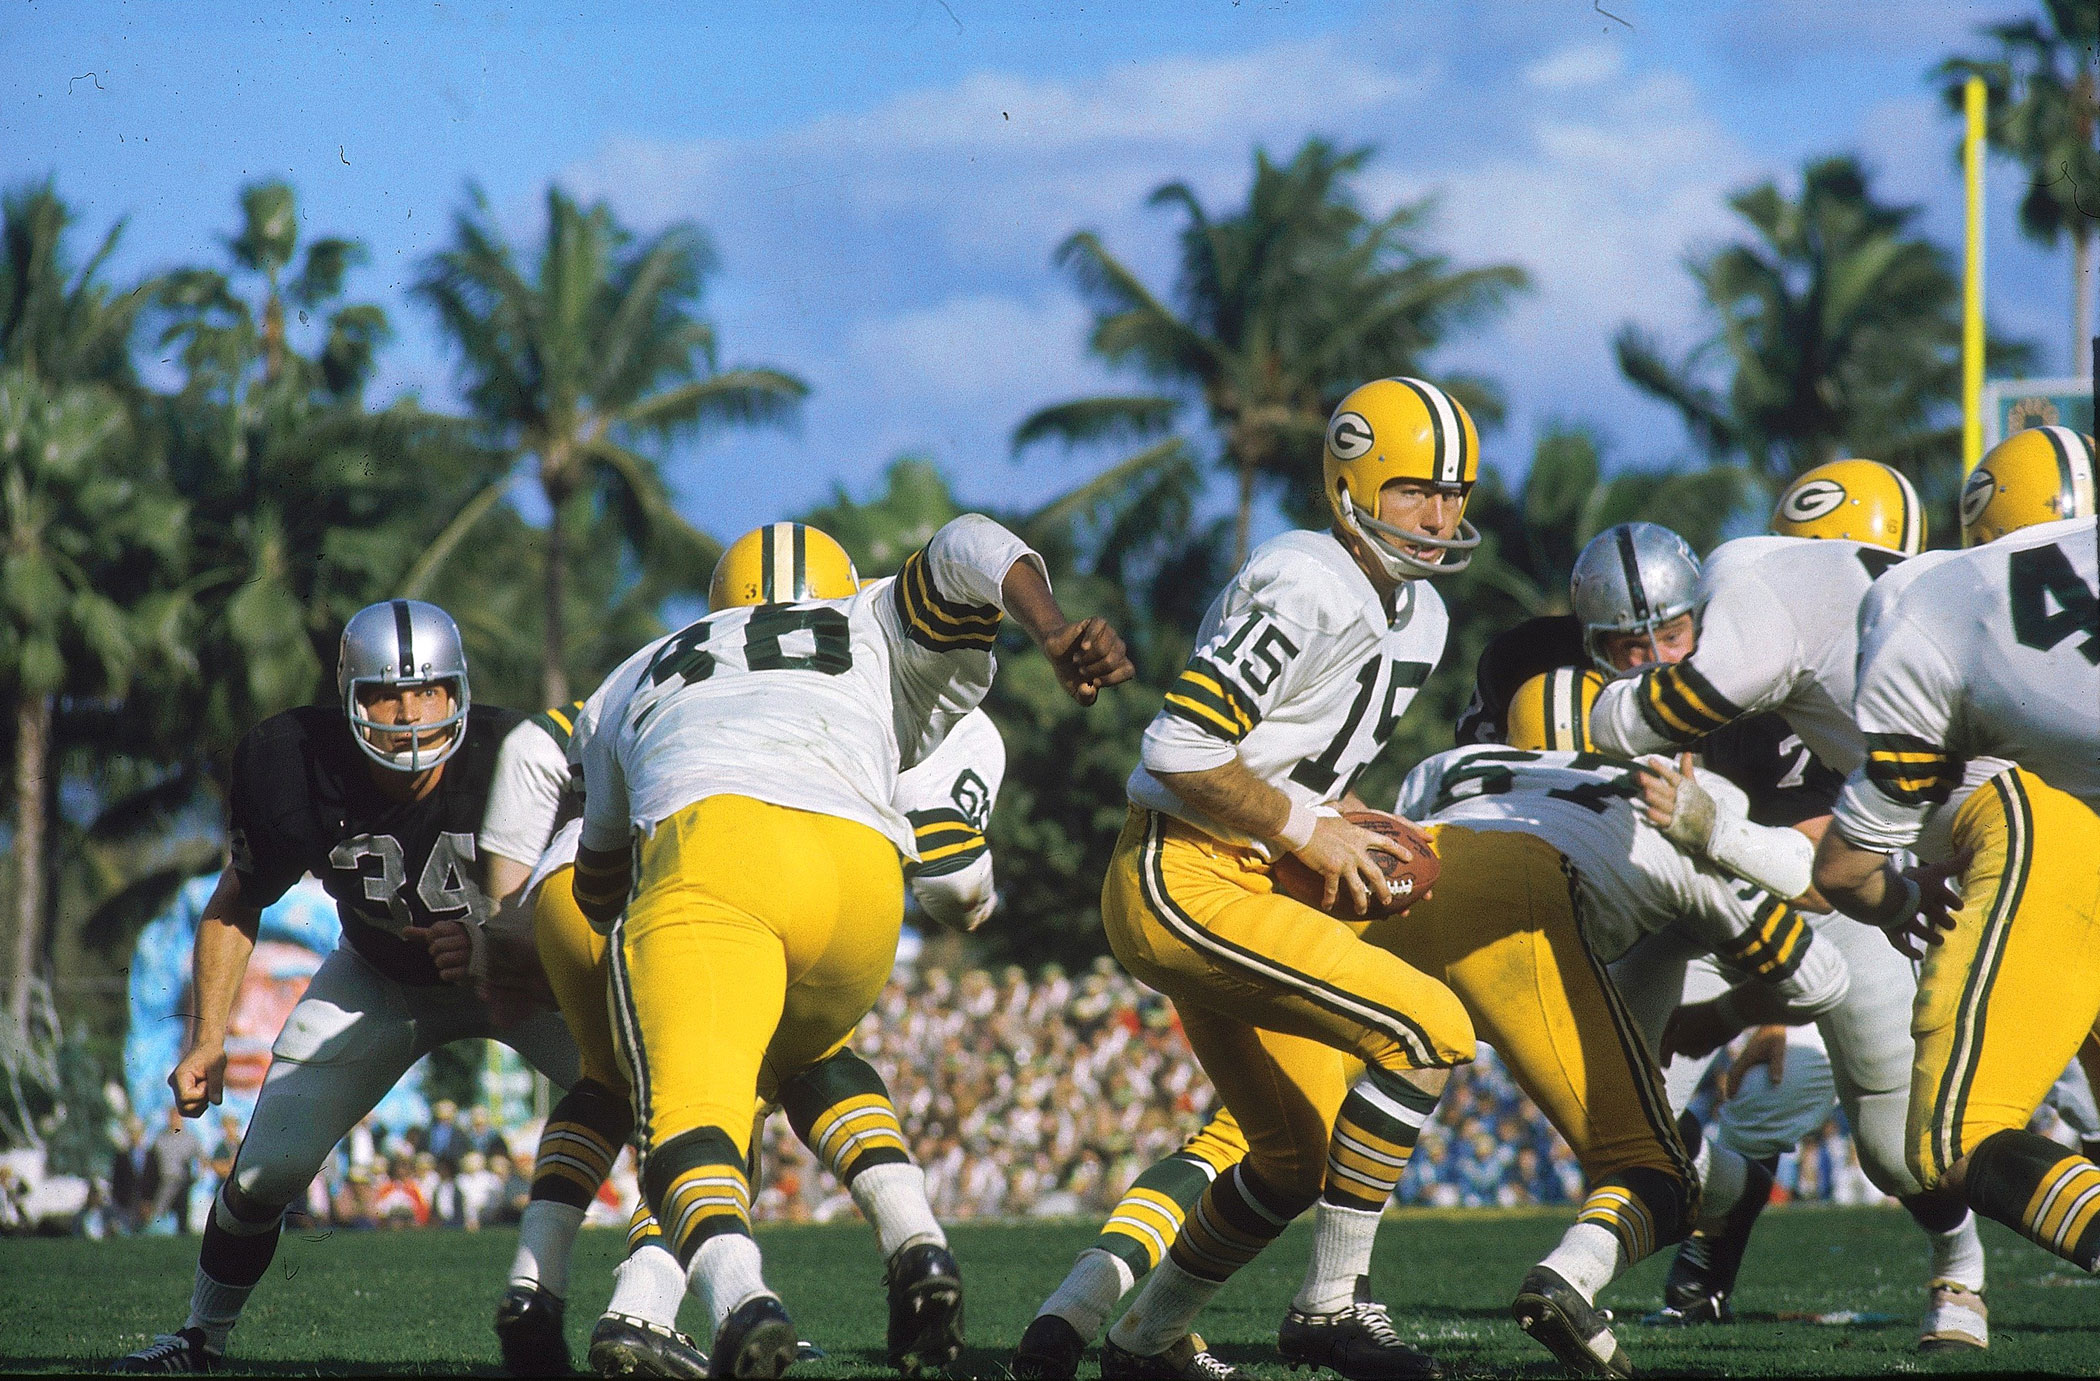 Super Bowl II, Jan. 14, 1968                               Green Bay Packers vs. Oakland Raiders in Miami